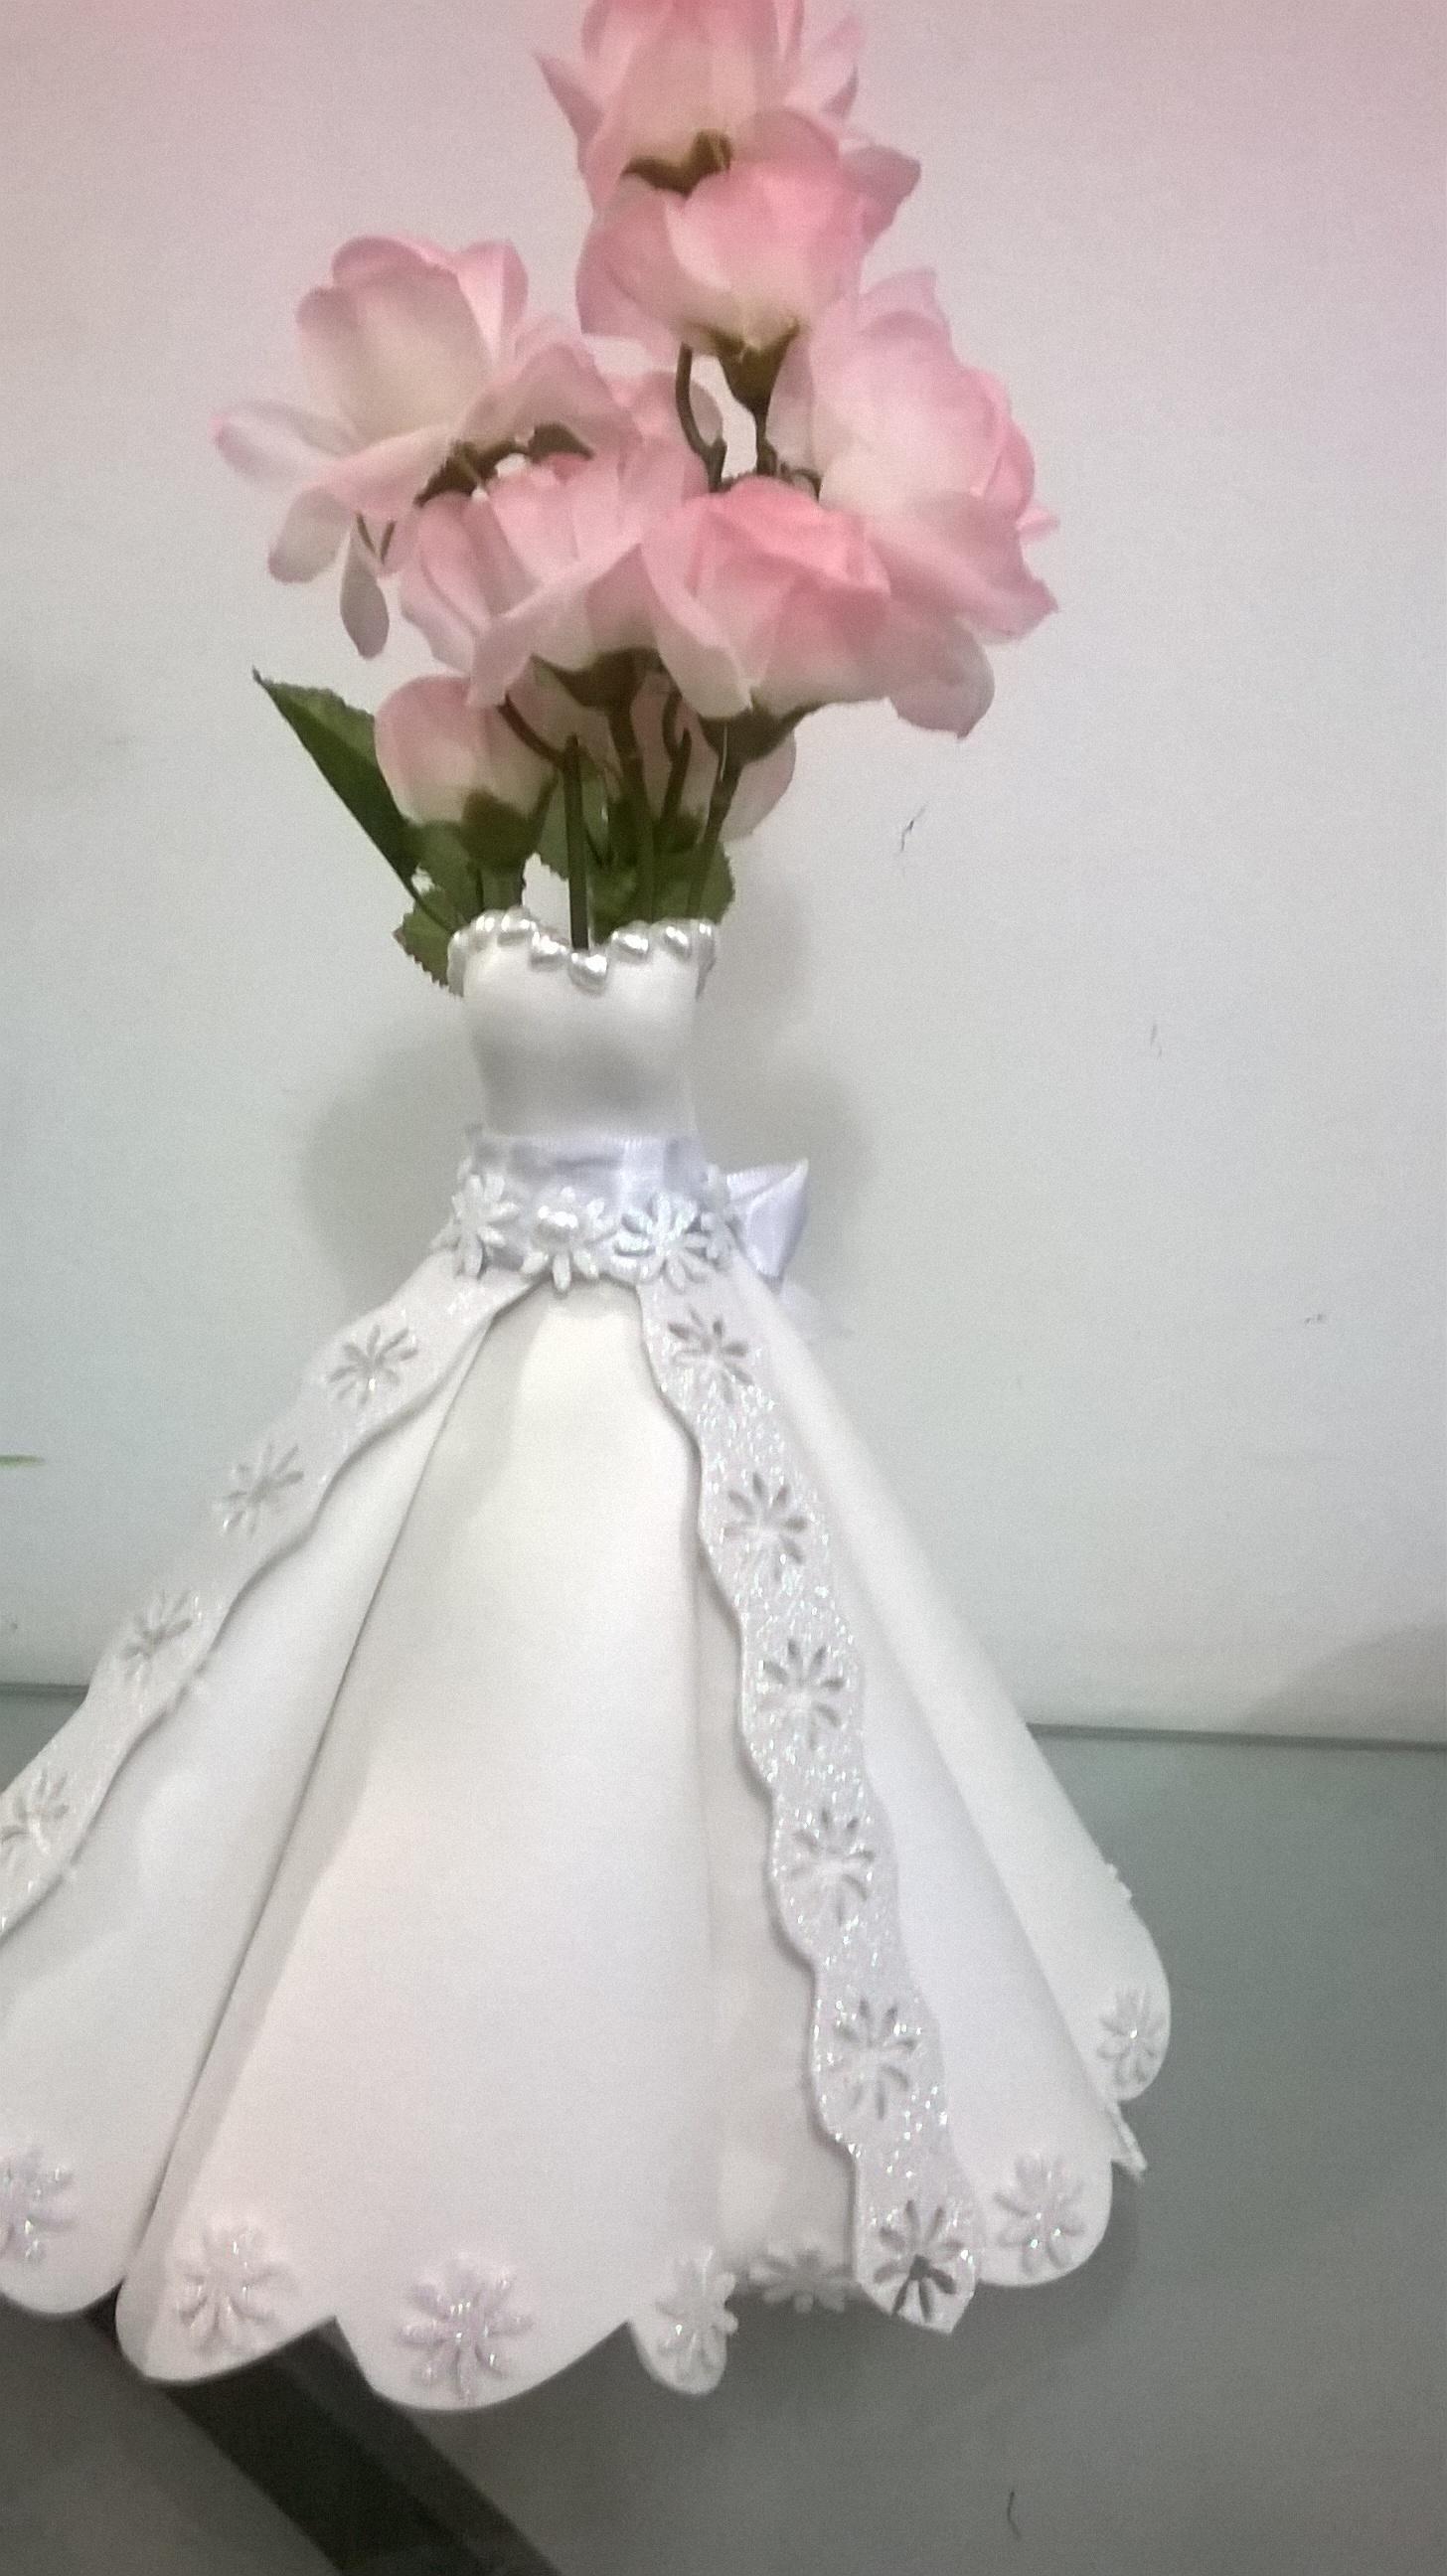 Enfeite de mesa casamento Ateli u00ea Duarte Criando Artes Elo7 -> Enfeites De Mesa Para Casamento Com Suculentas